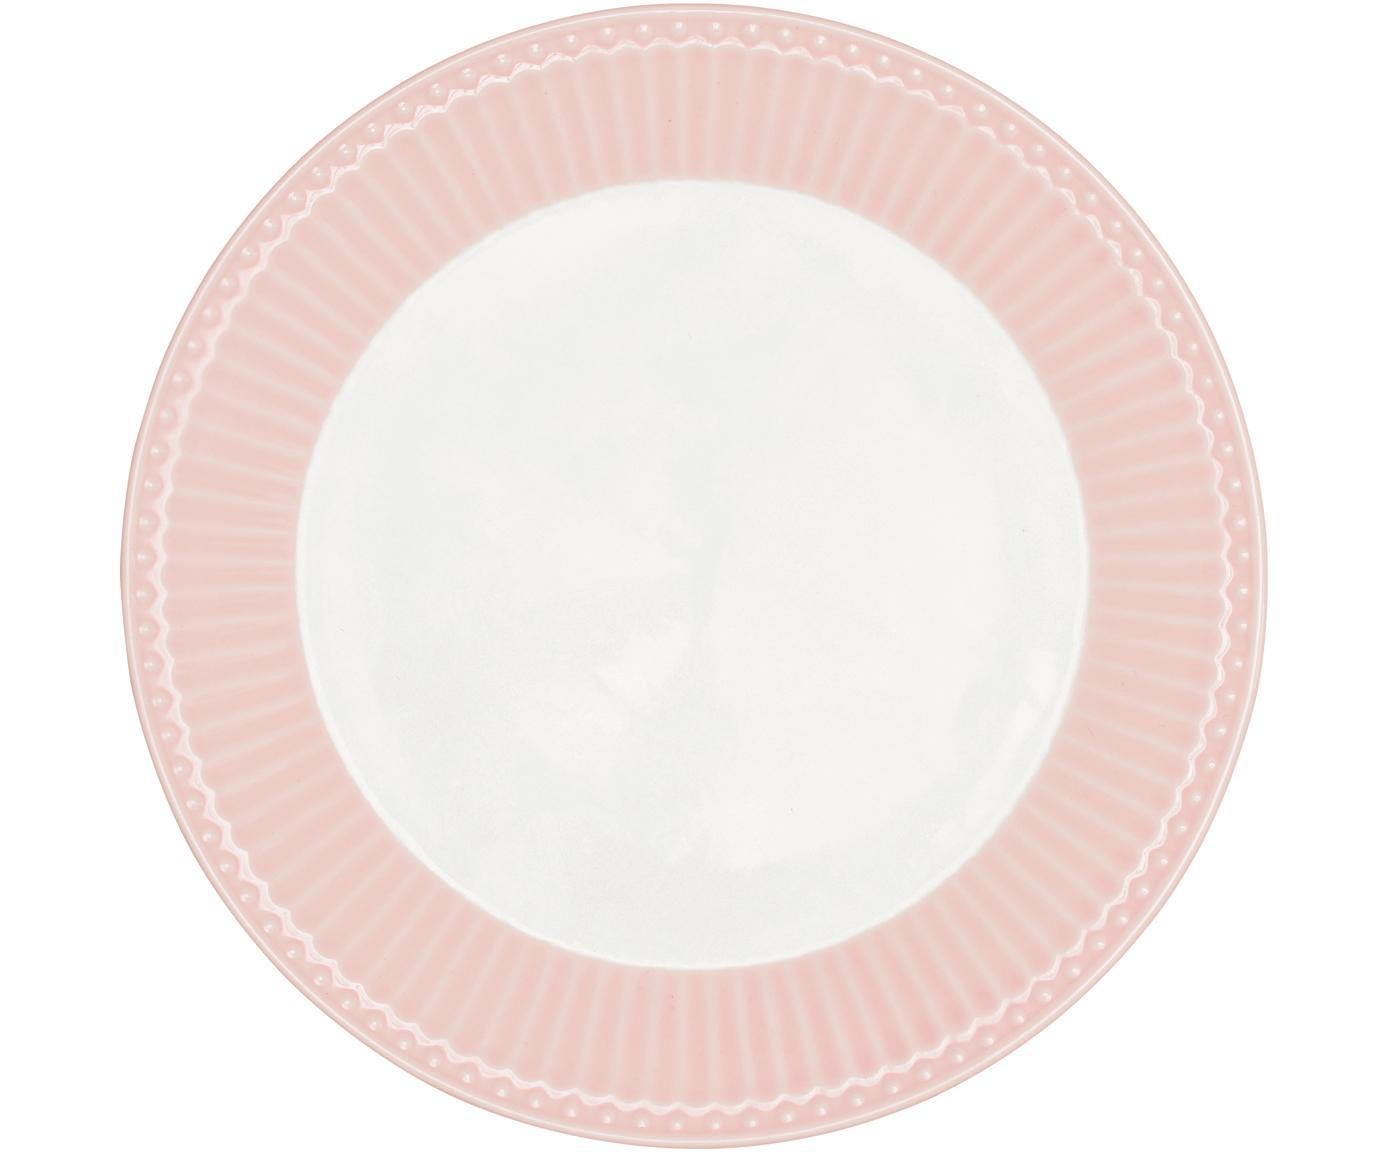 Platos postre Alice, 2uds., Porcelana, Rosa, blanco, Ø 23 cm